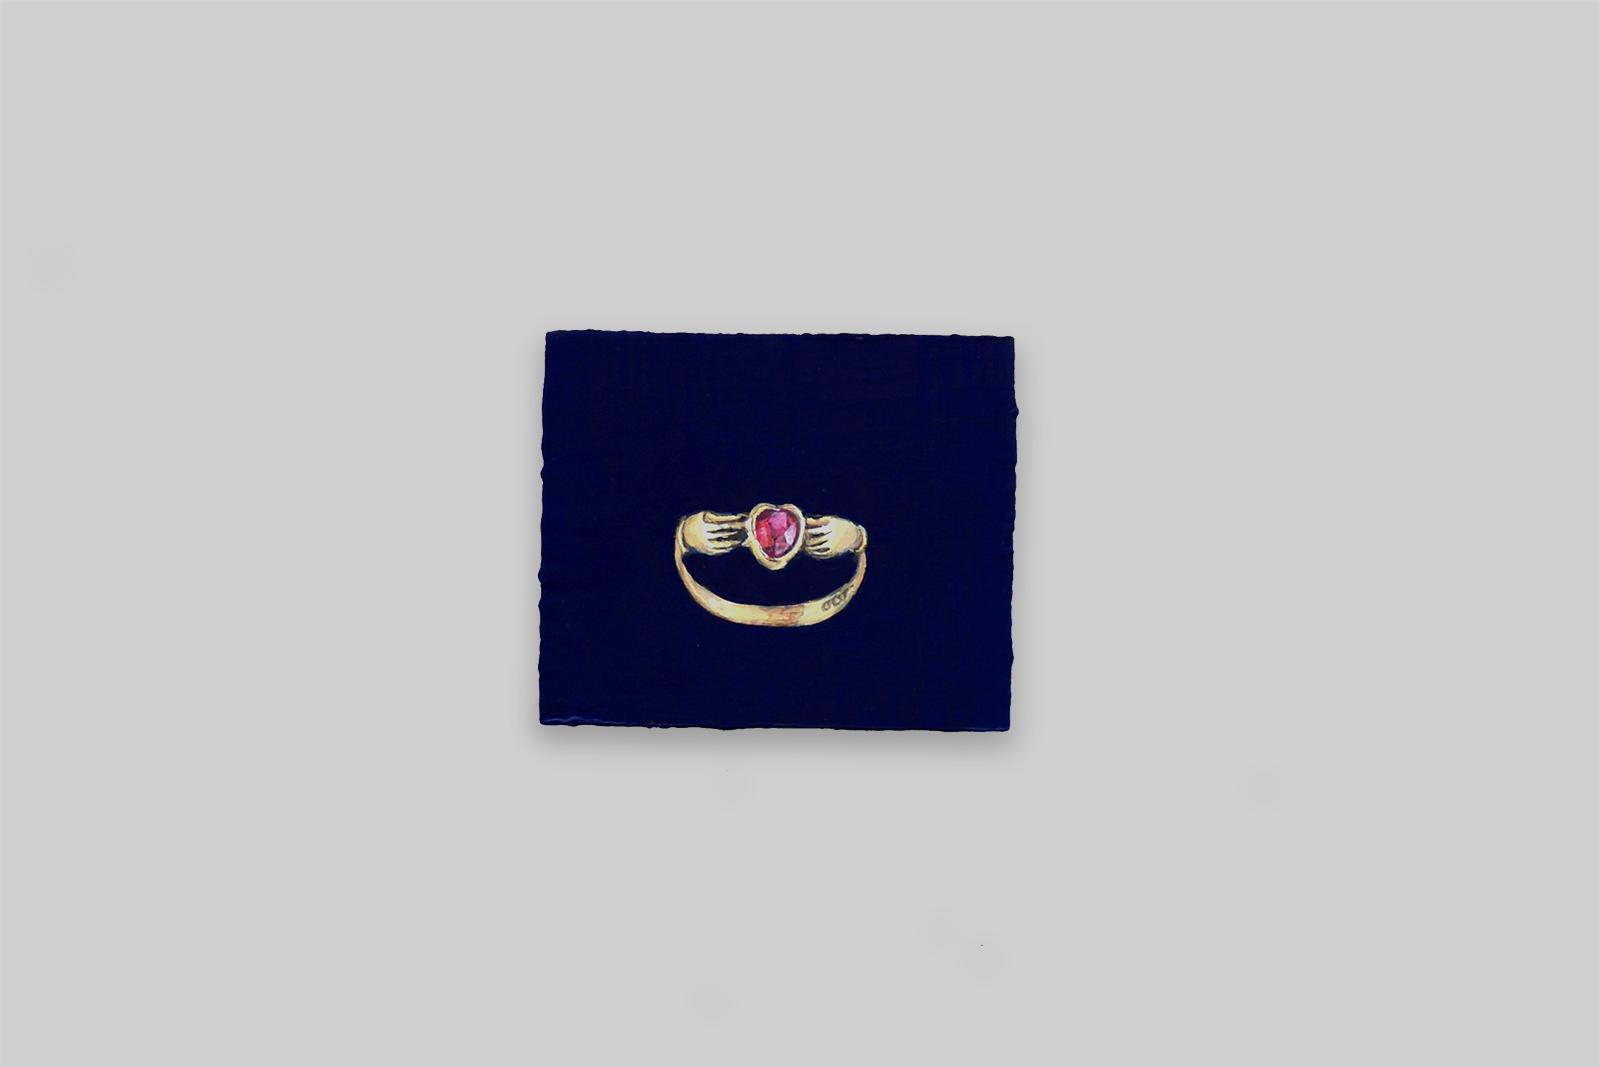 'ruby ring', 2012, tempera/paneel, 10 x 12 cm